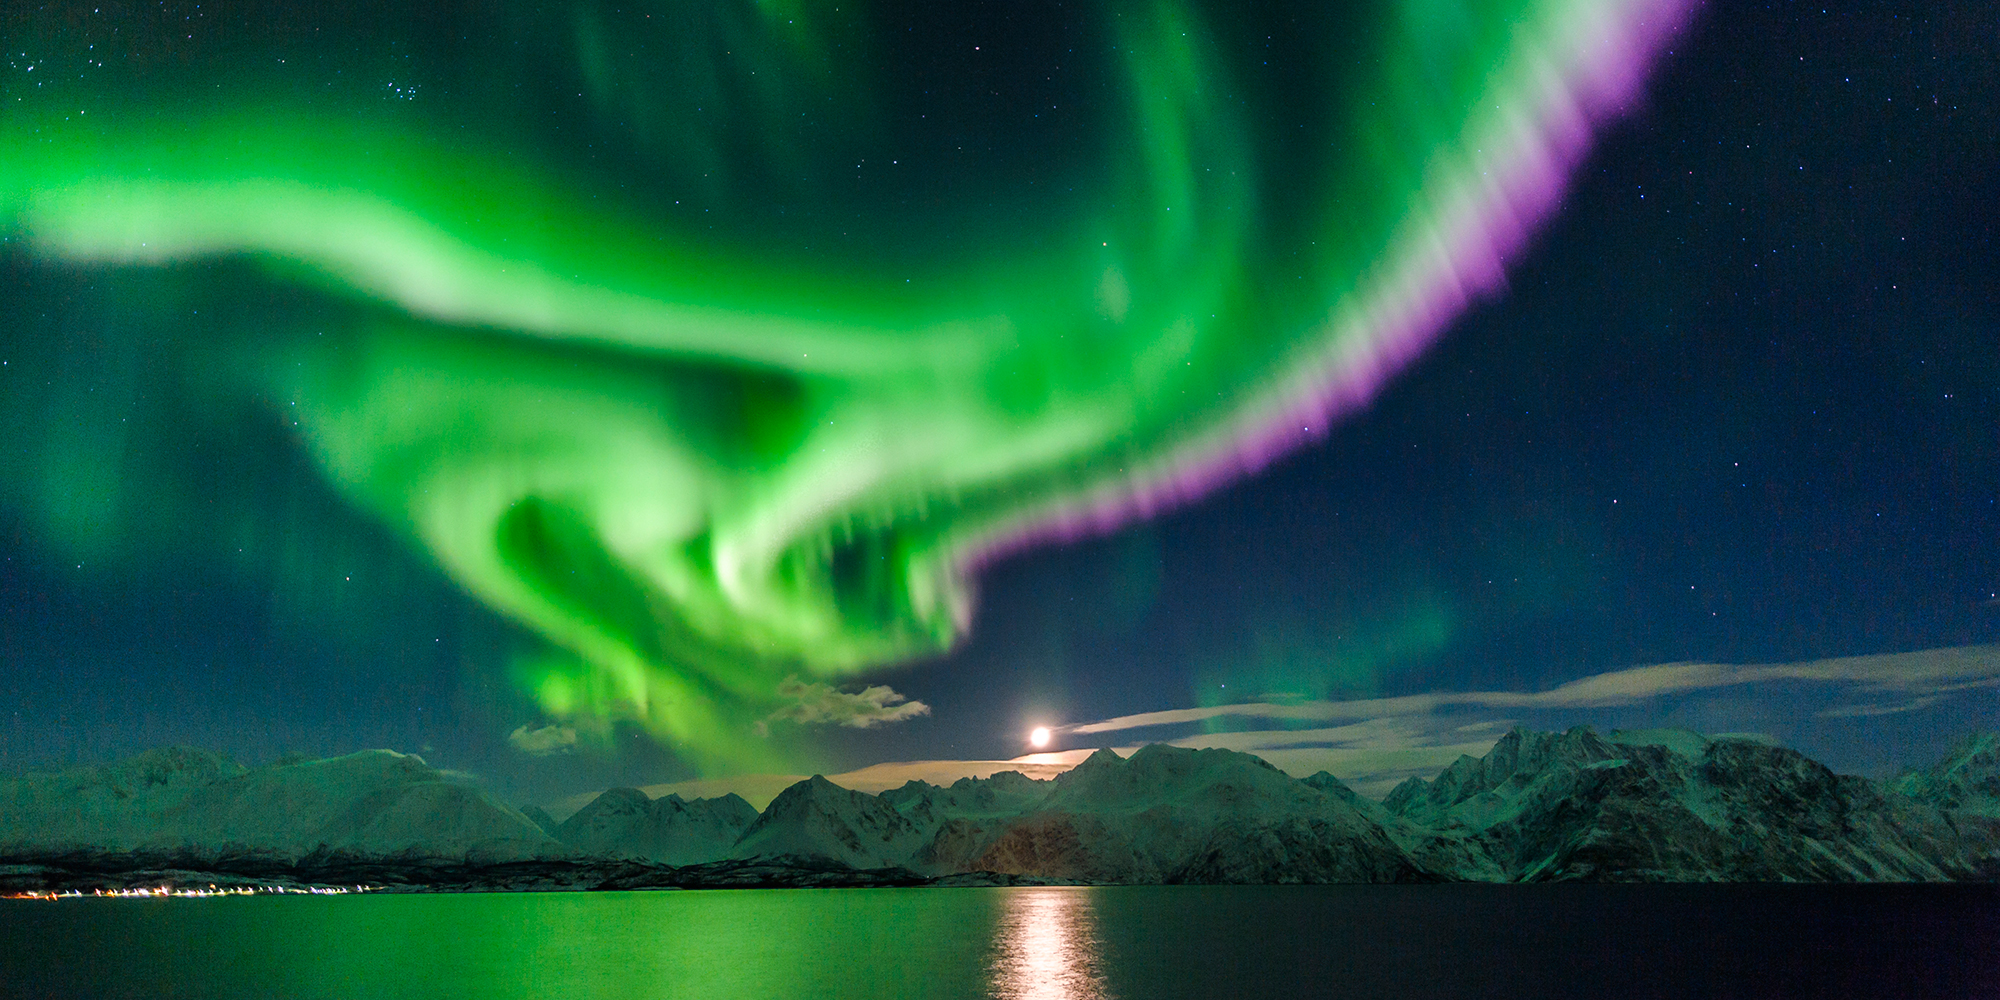 northern_lights_lyngenfjord_northern_norway_nav_d3ffe4a3-bde9-4ffa-8a1c-a42b84c60681